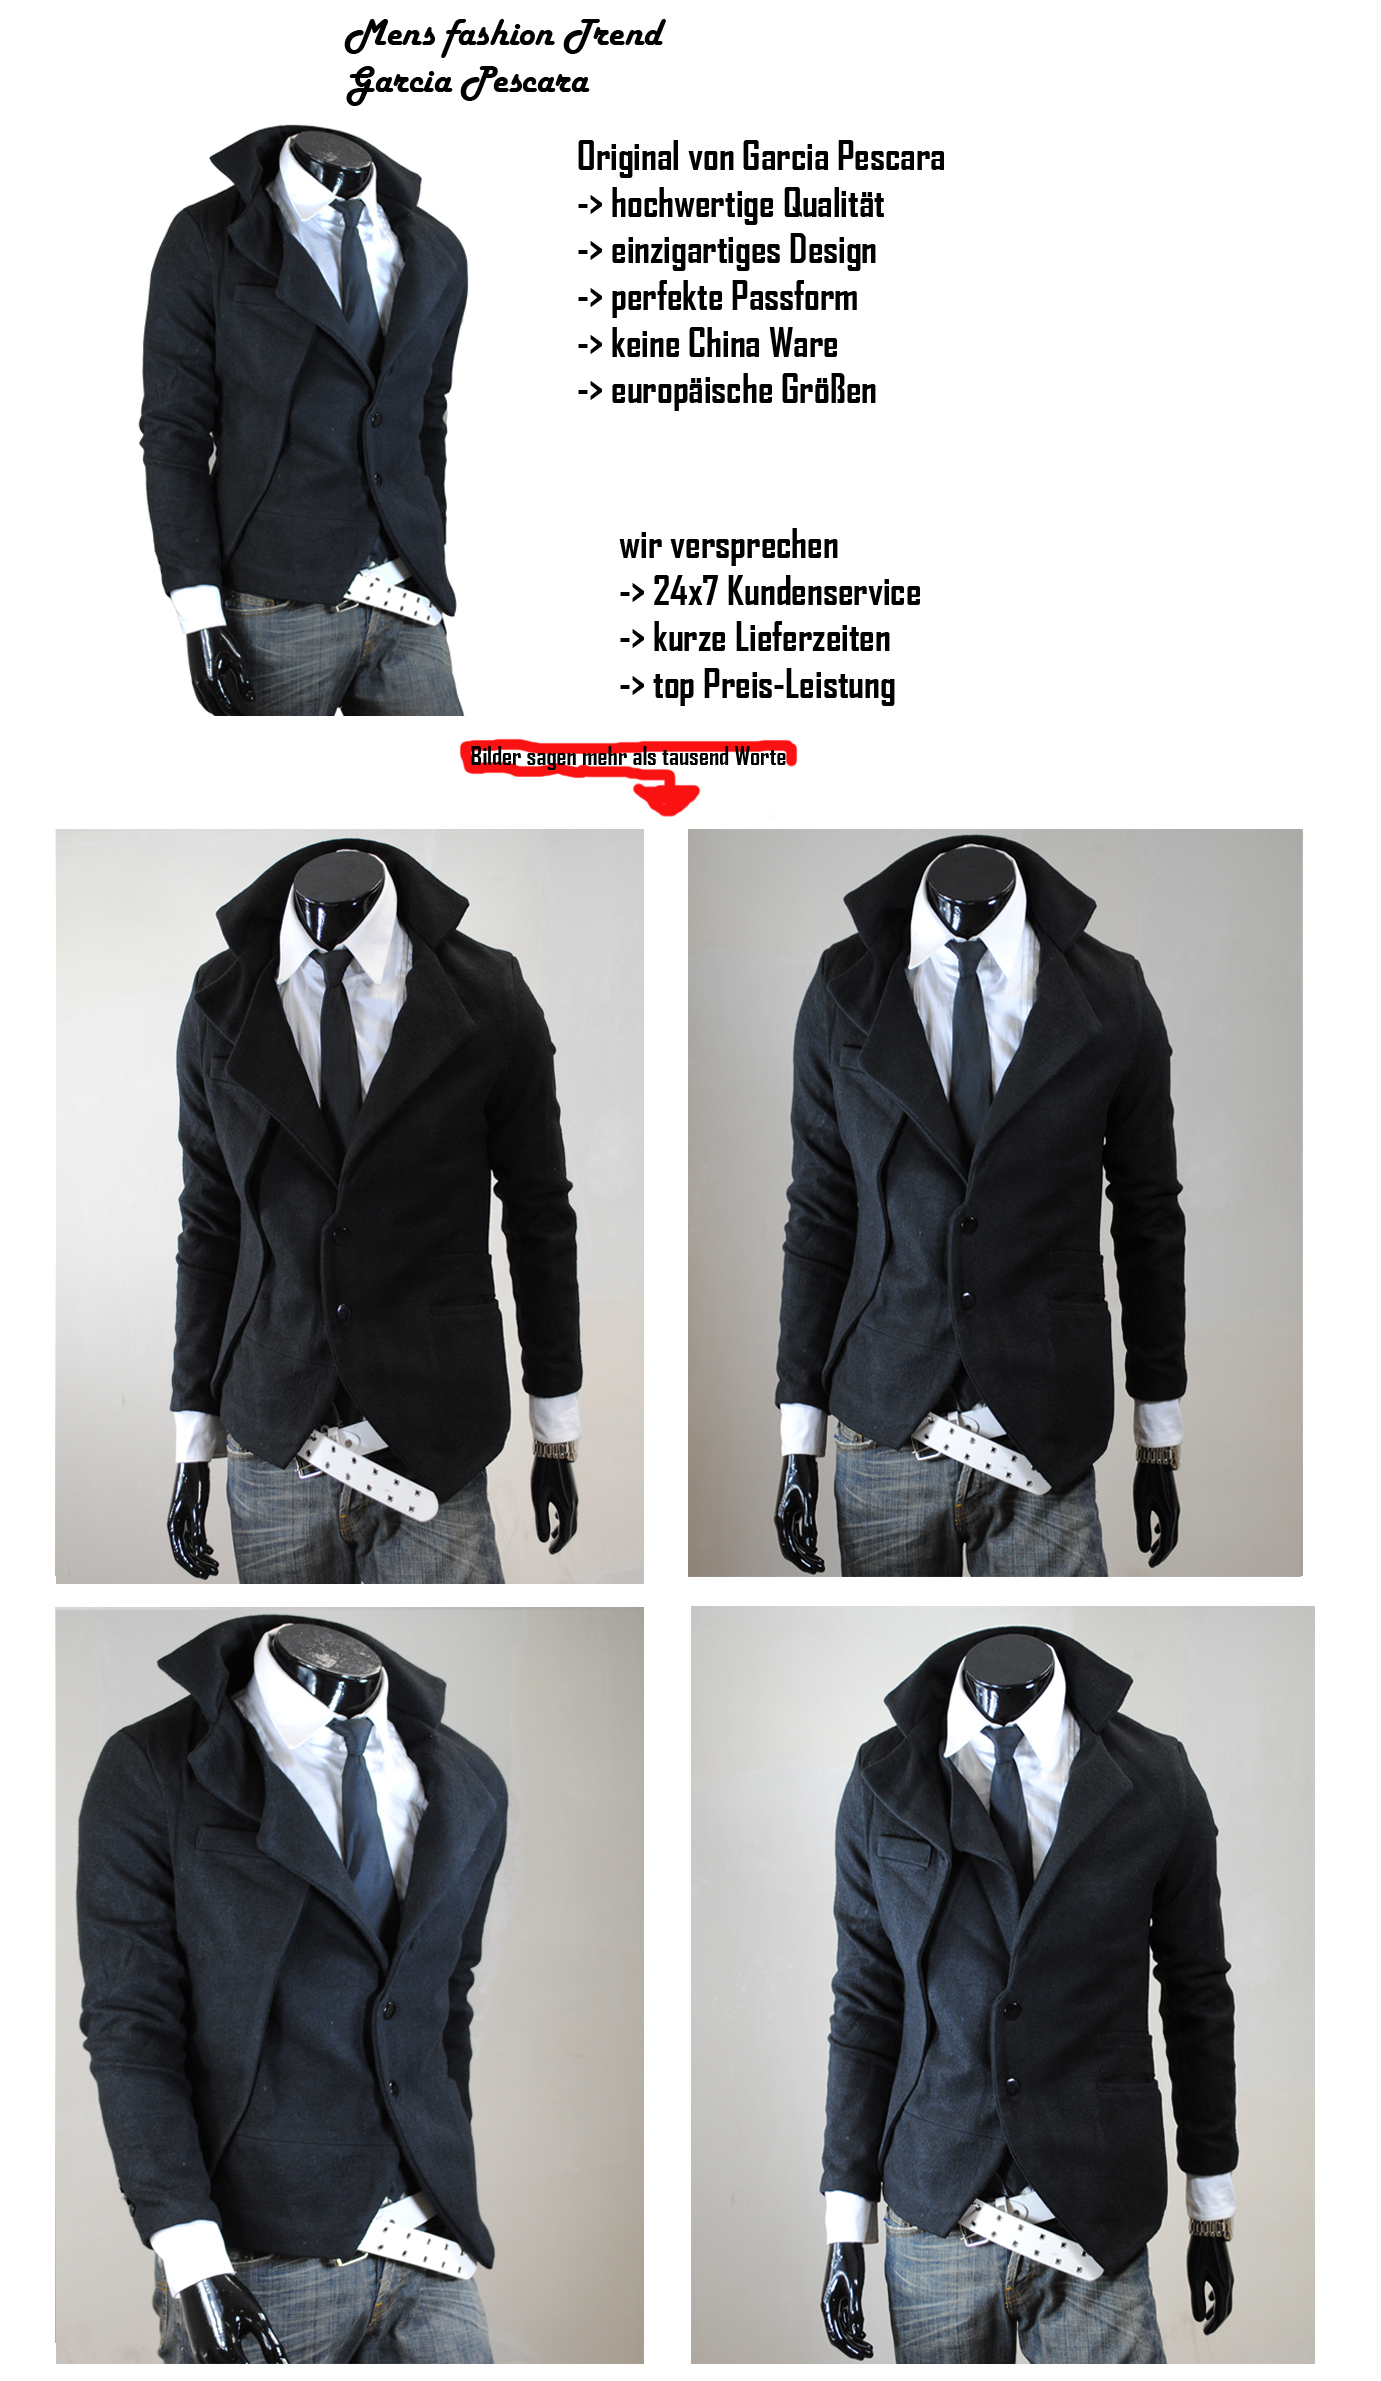 gp herren schwarz s m l xl coat trenchcoat jacke parka mantel bergangsjacke ebay. Black Bedroom Furniture Sets. Home Design Ideas